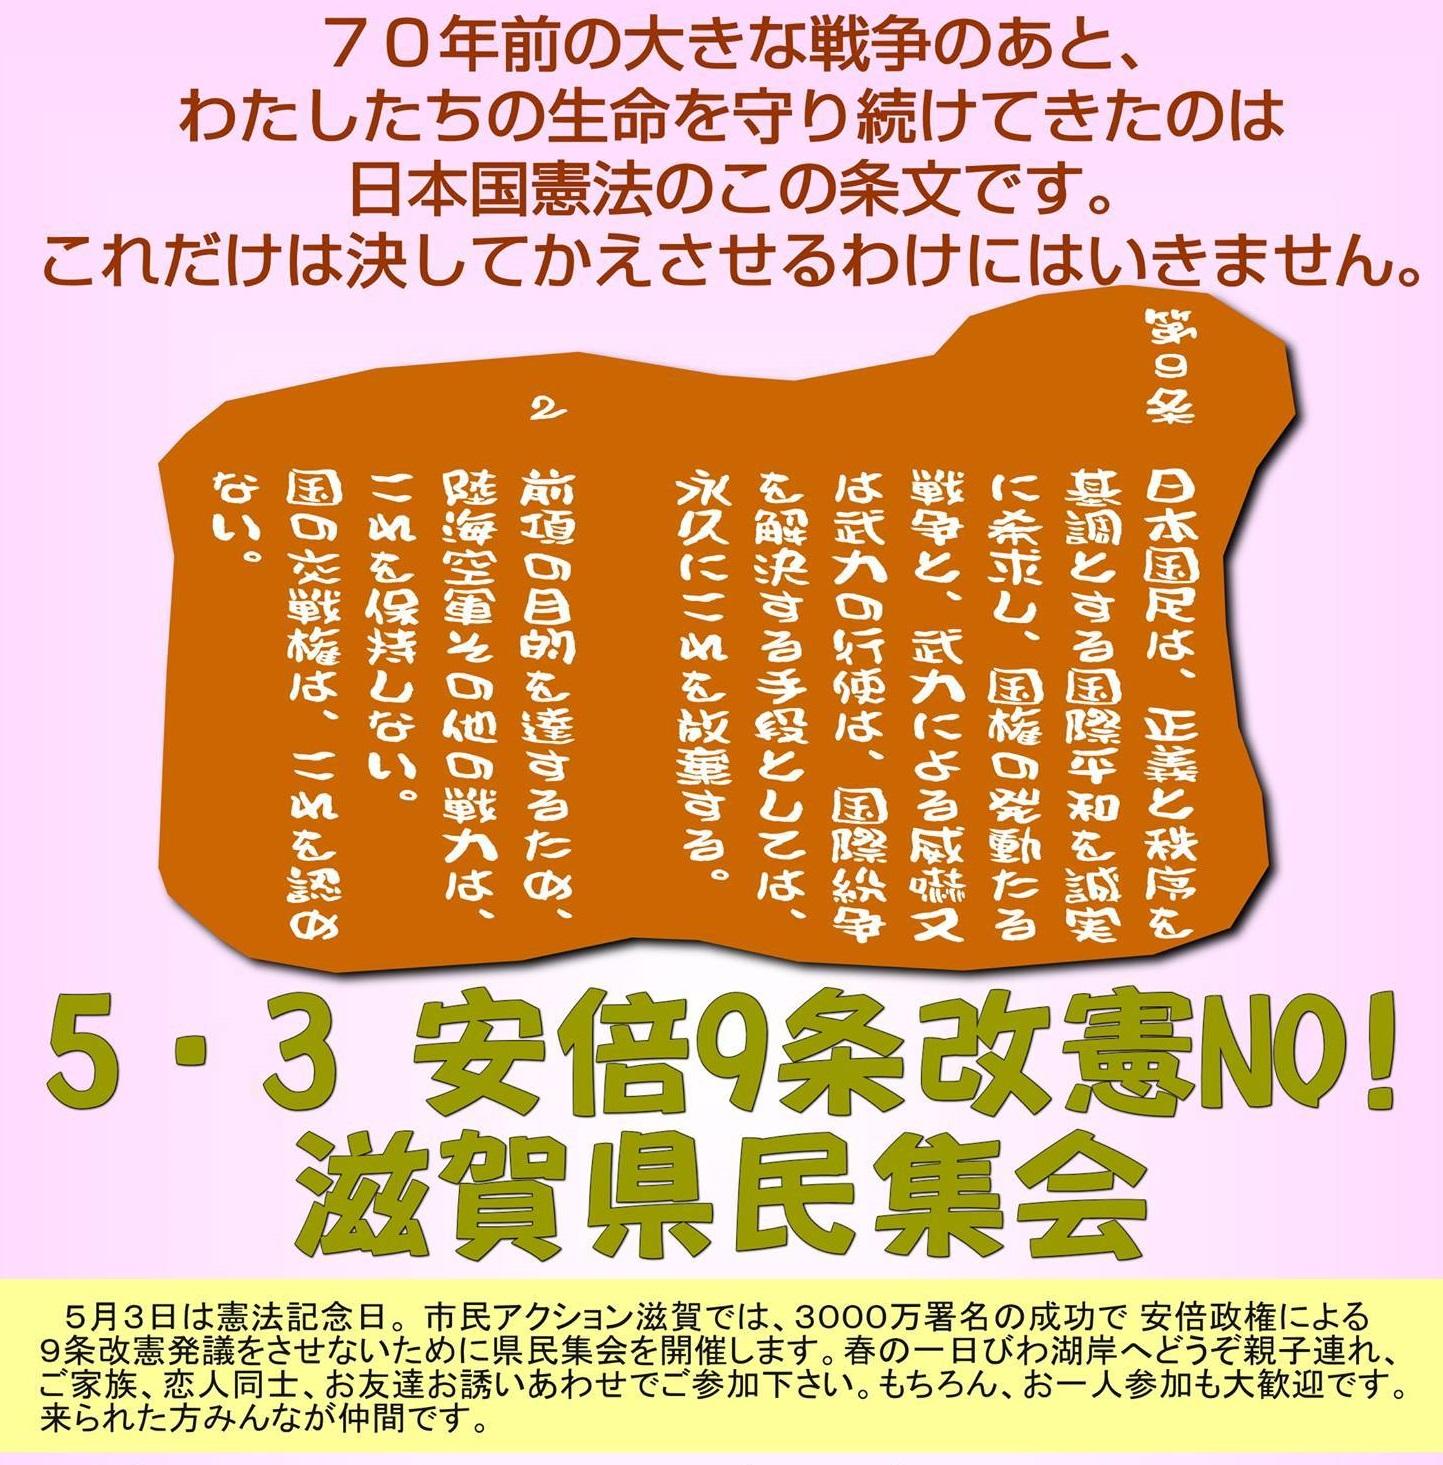 5.3安倍9条改憲NO!滋賀県集会 デモ